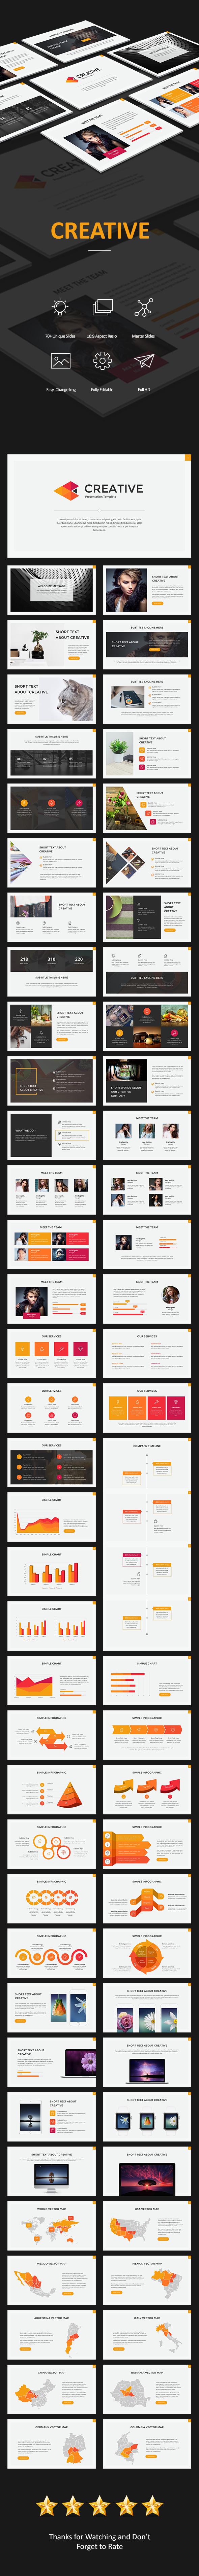 GraphicRiver Creative Powerpoint 20395446